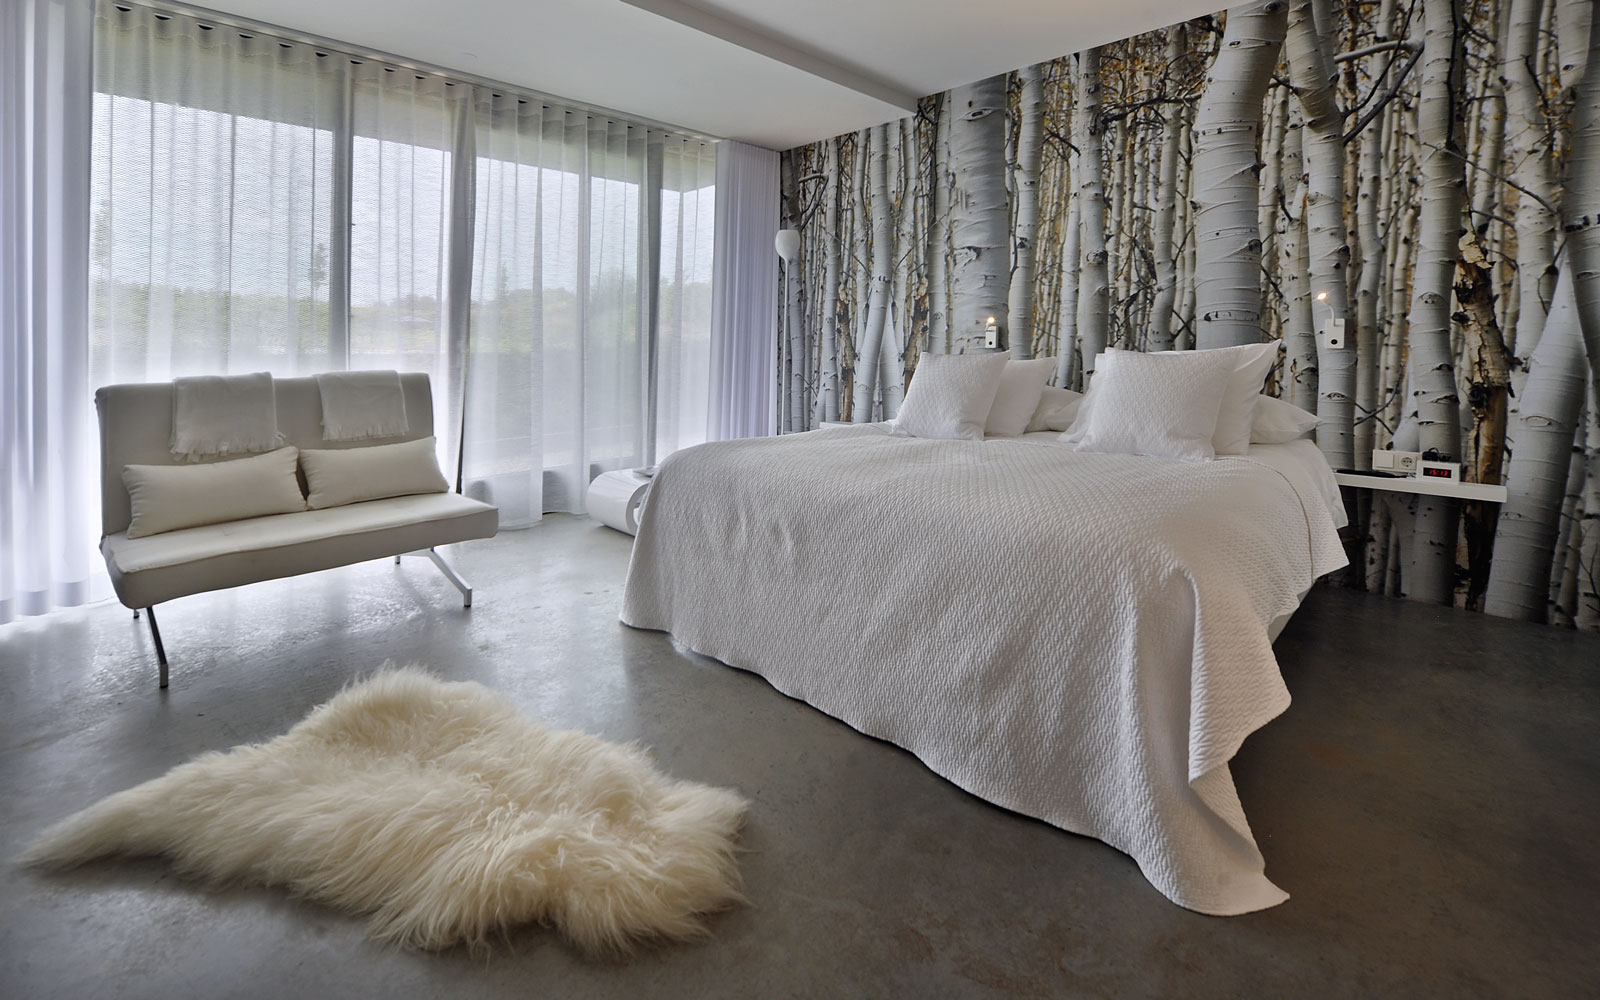 Slaapkamer, bed, Auping, behang, wit, rustig, La Marquise, Hertroijs Architekten